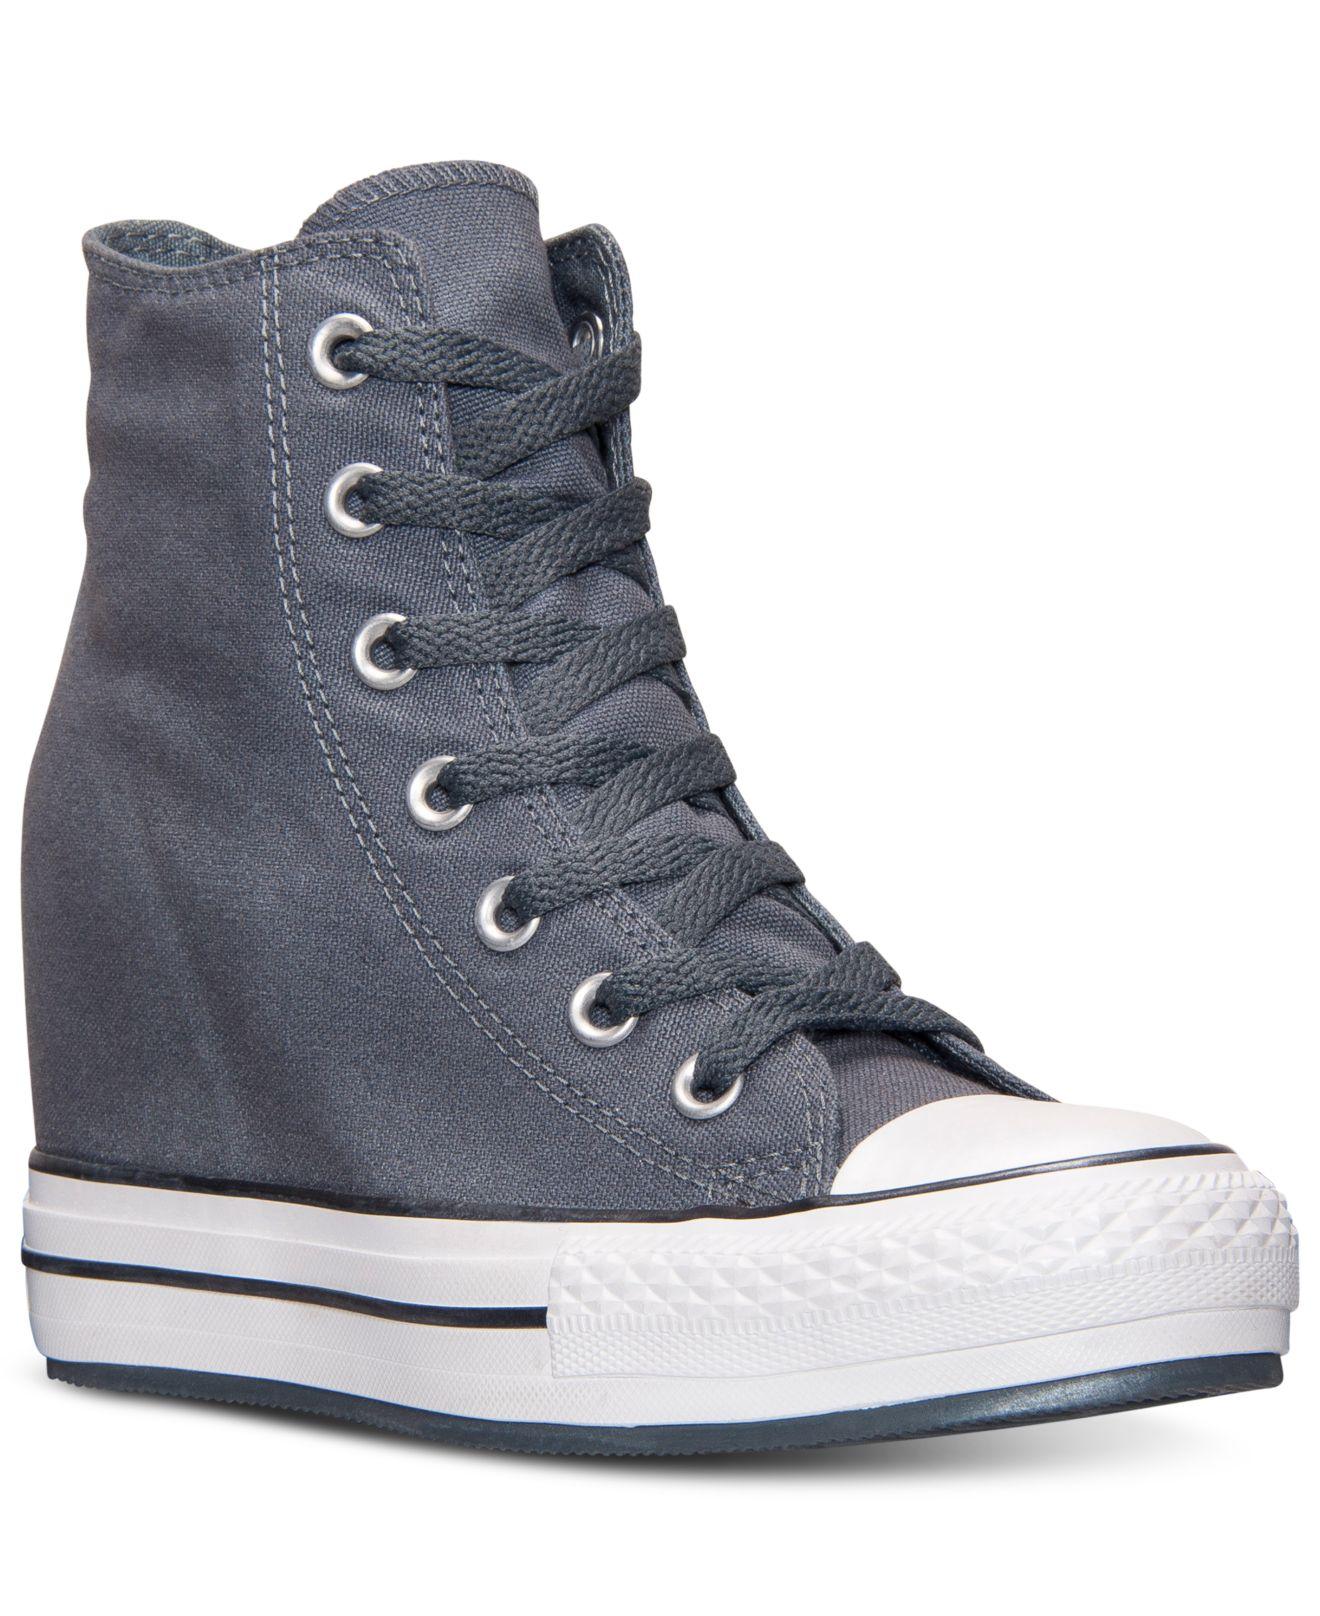 converse chuck taylor all star metallic platform plus sneakers add7ae34b